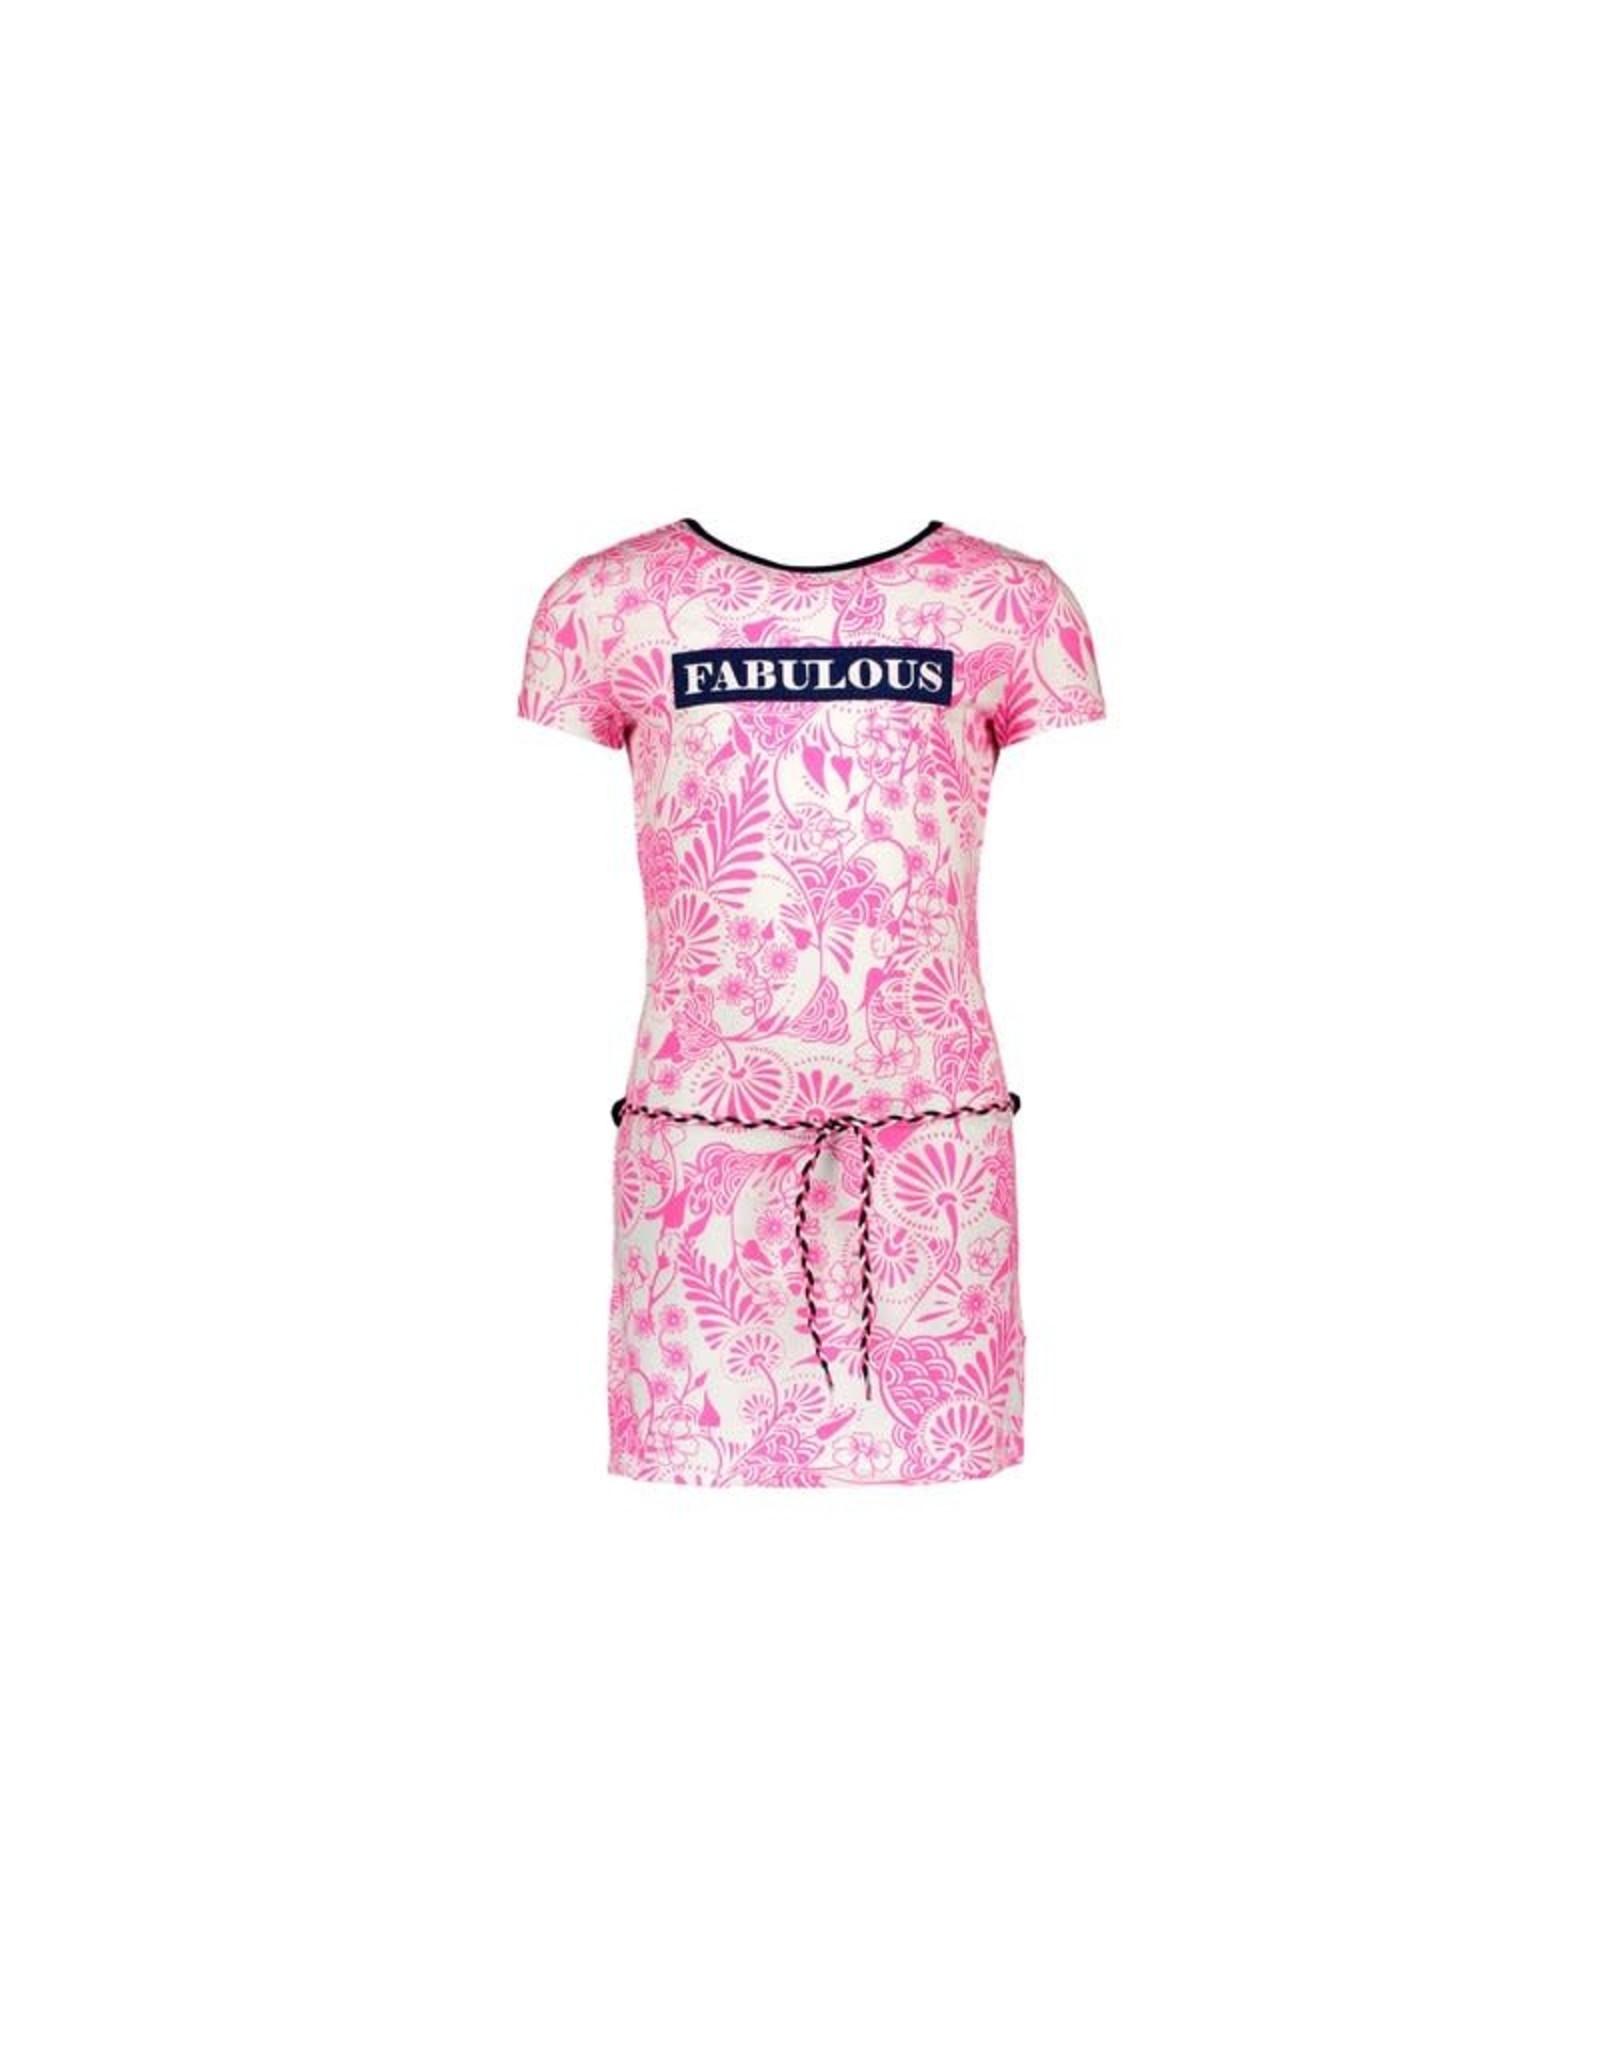 B-Nosy jurk delfts roze met strik detail in de nek